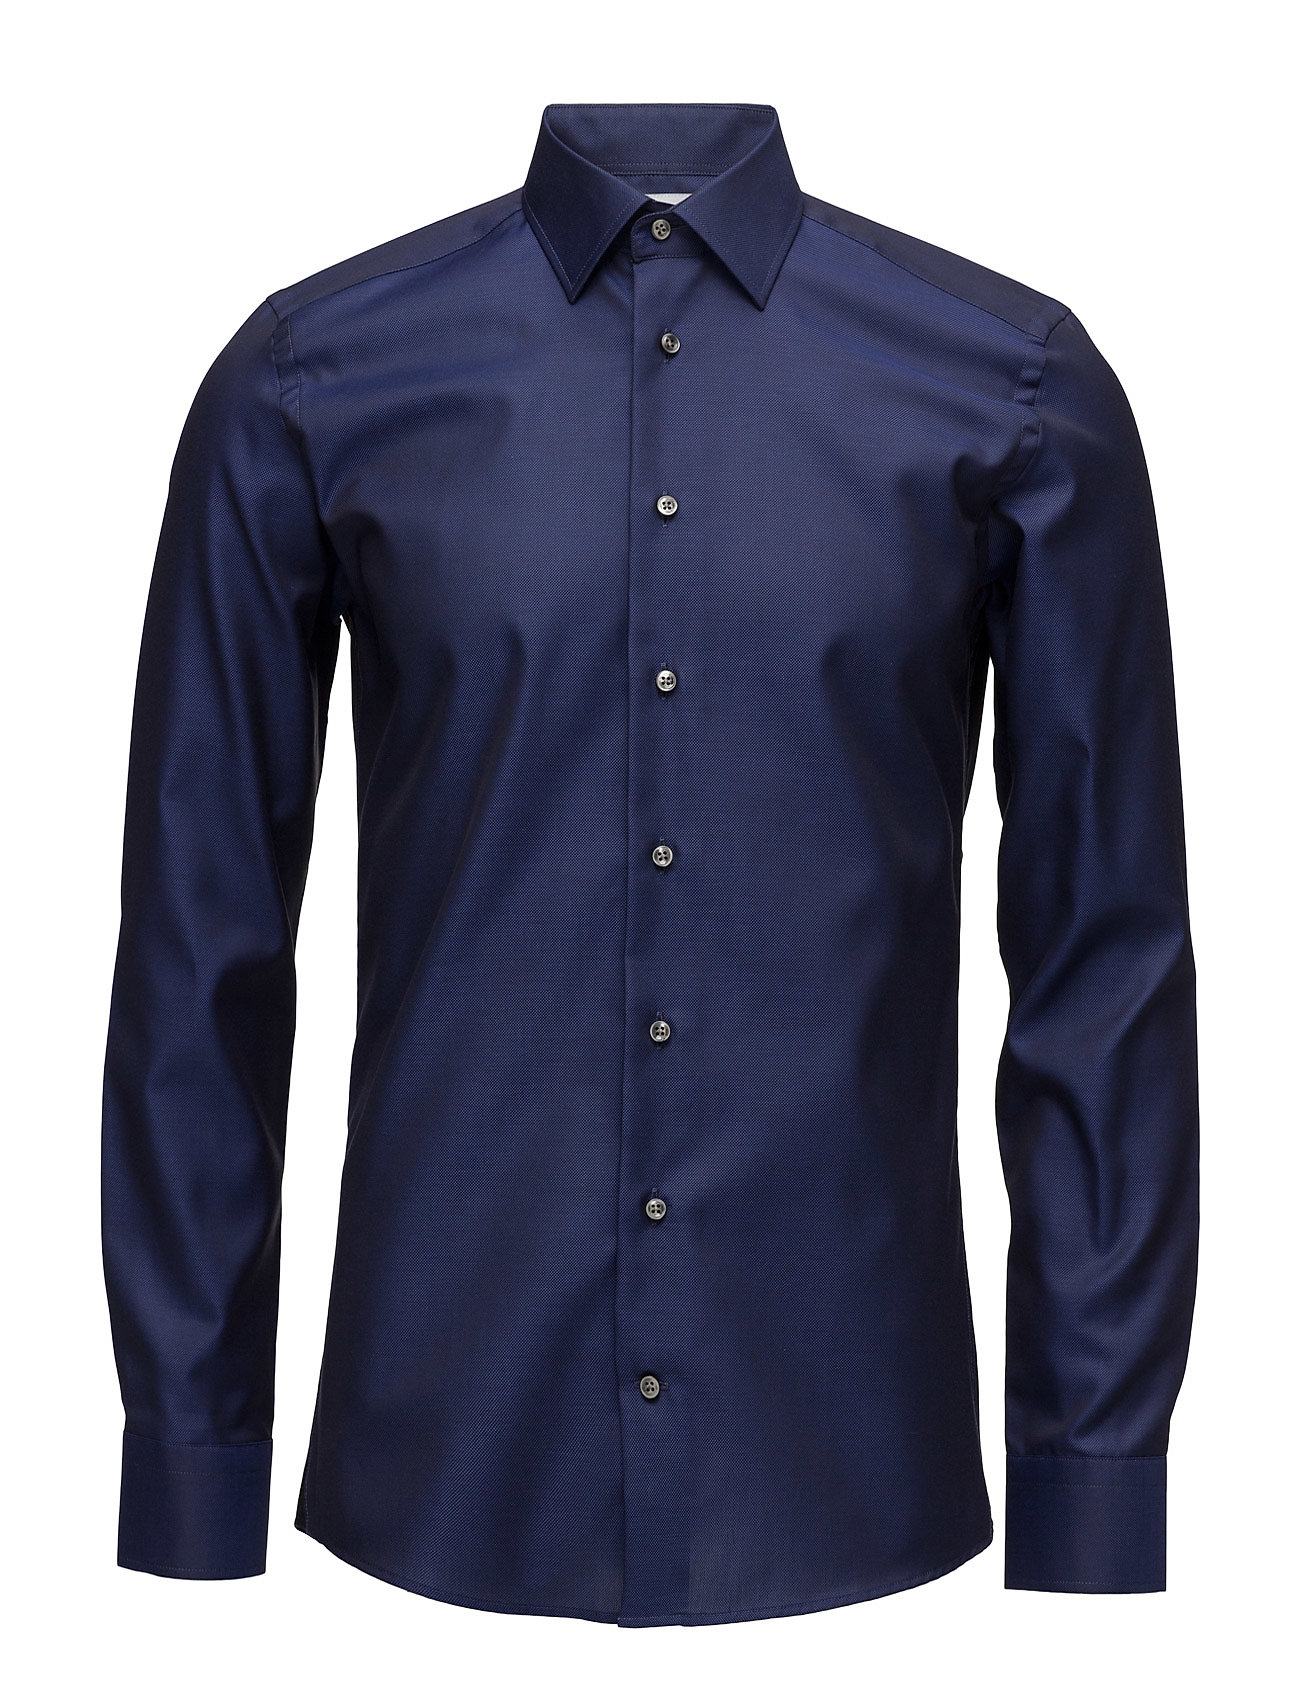 xo shirtmaker 8543 - jake sc fra boozt.com dk